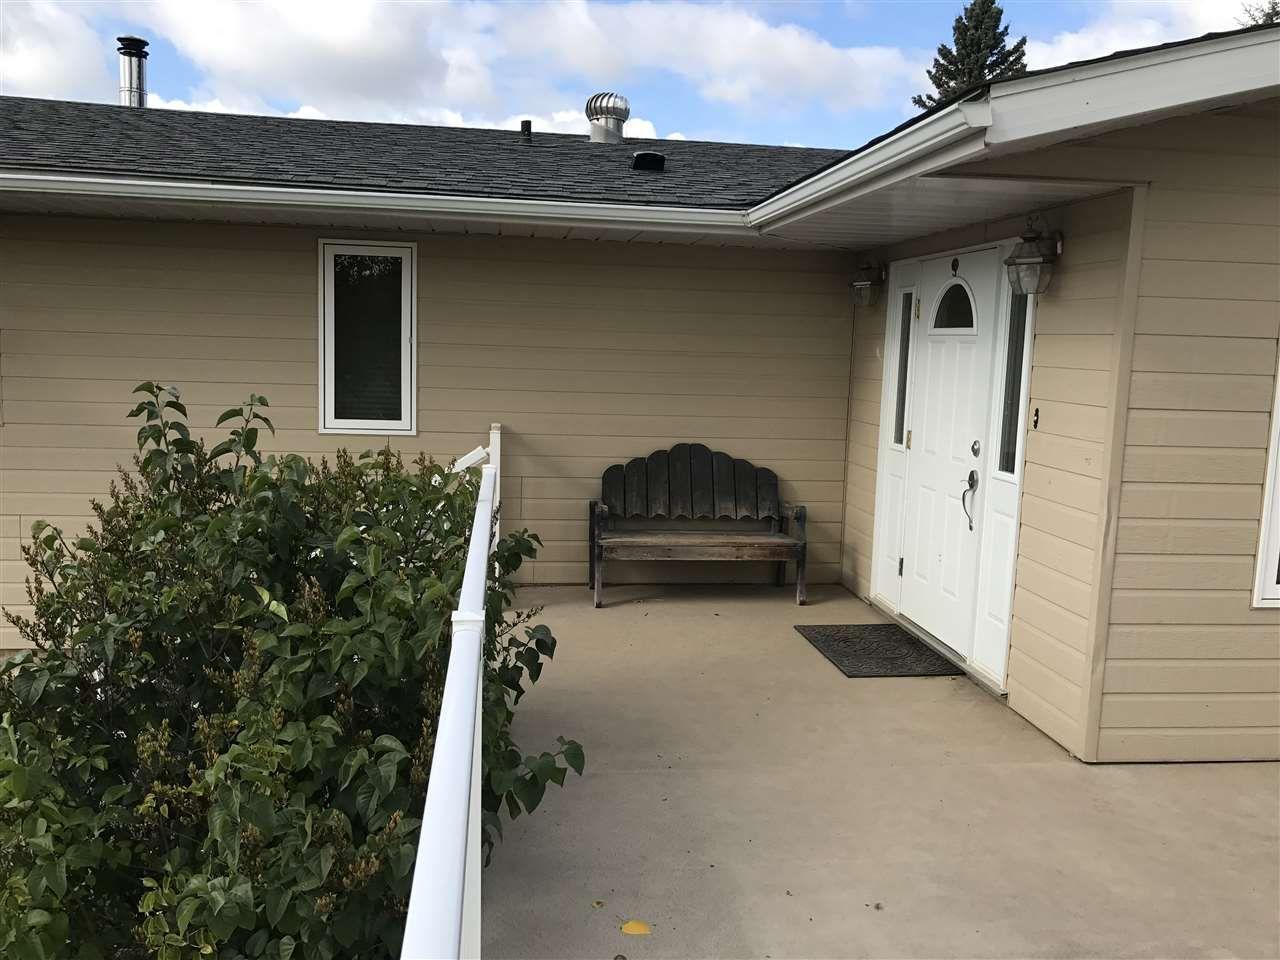 Photo 5: Photos: 9813 269 Road in Fort St. John: Fort St. John - Rural W 100th House for sale (Fort St. John (Zone 60))  : MLS®# R2208403